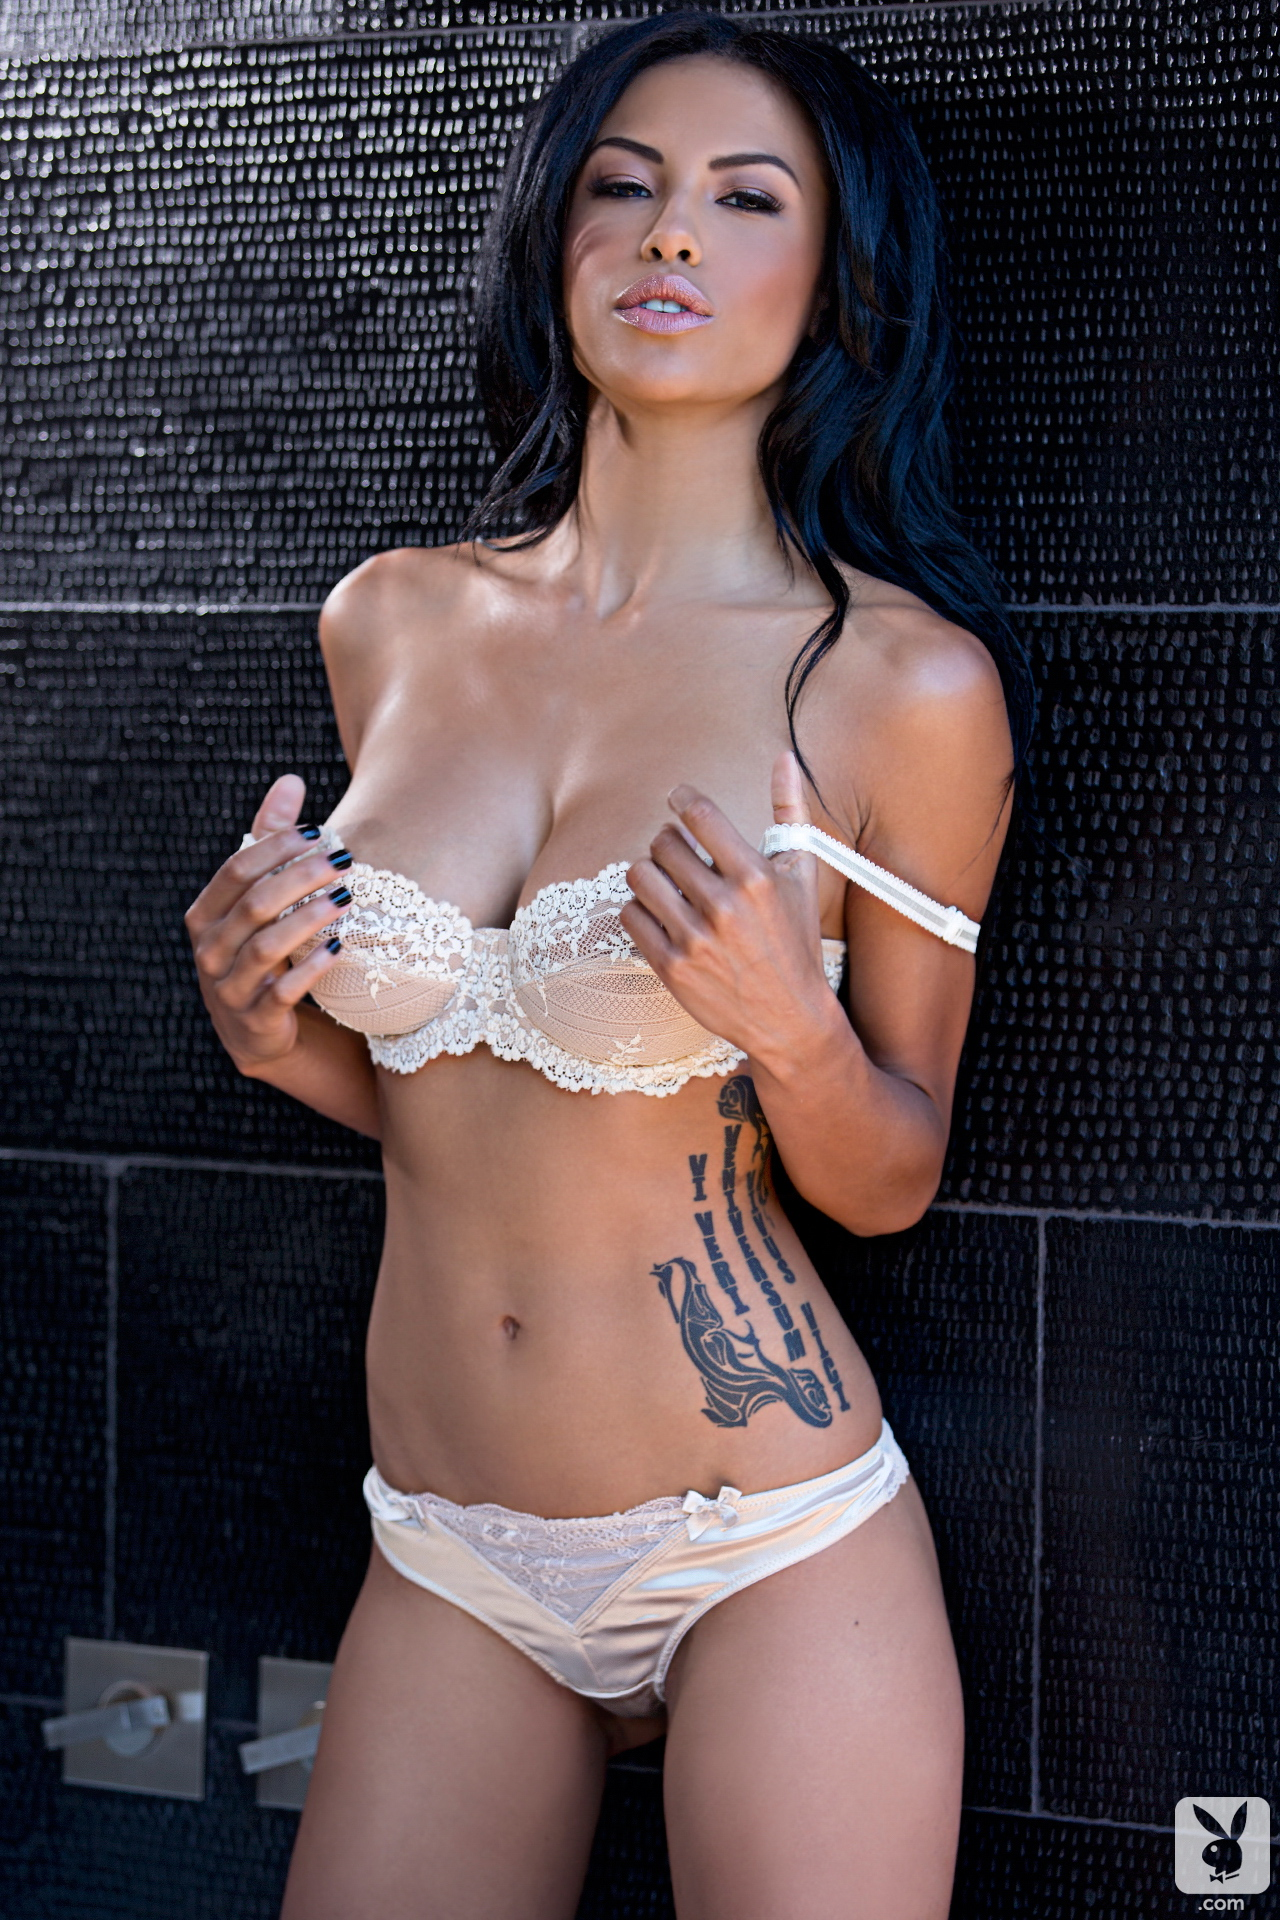 kylie-johnson-brunette-nude-bathroom-playboy-10